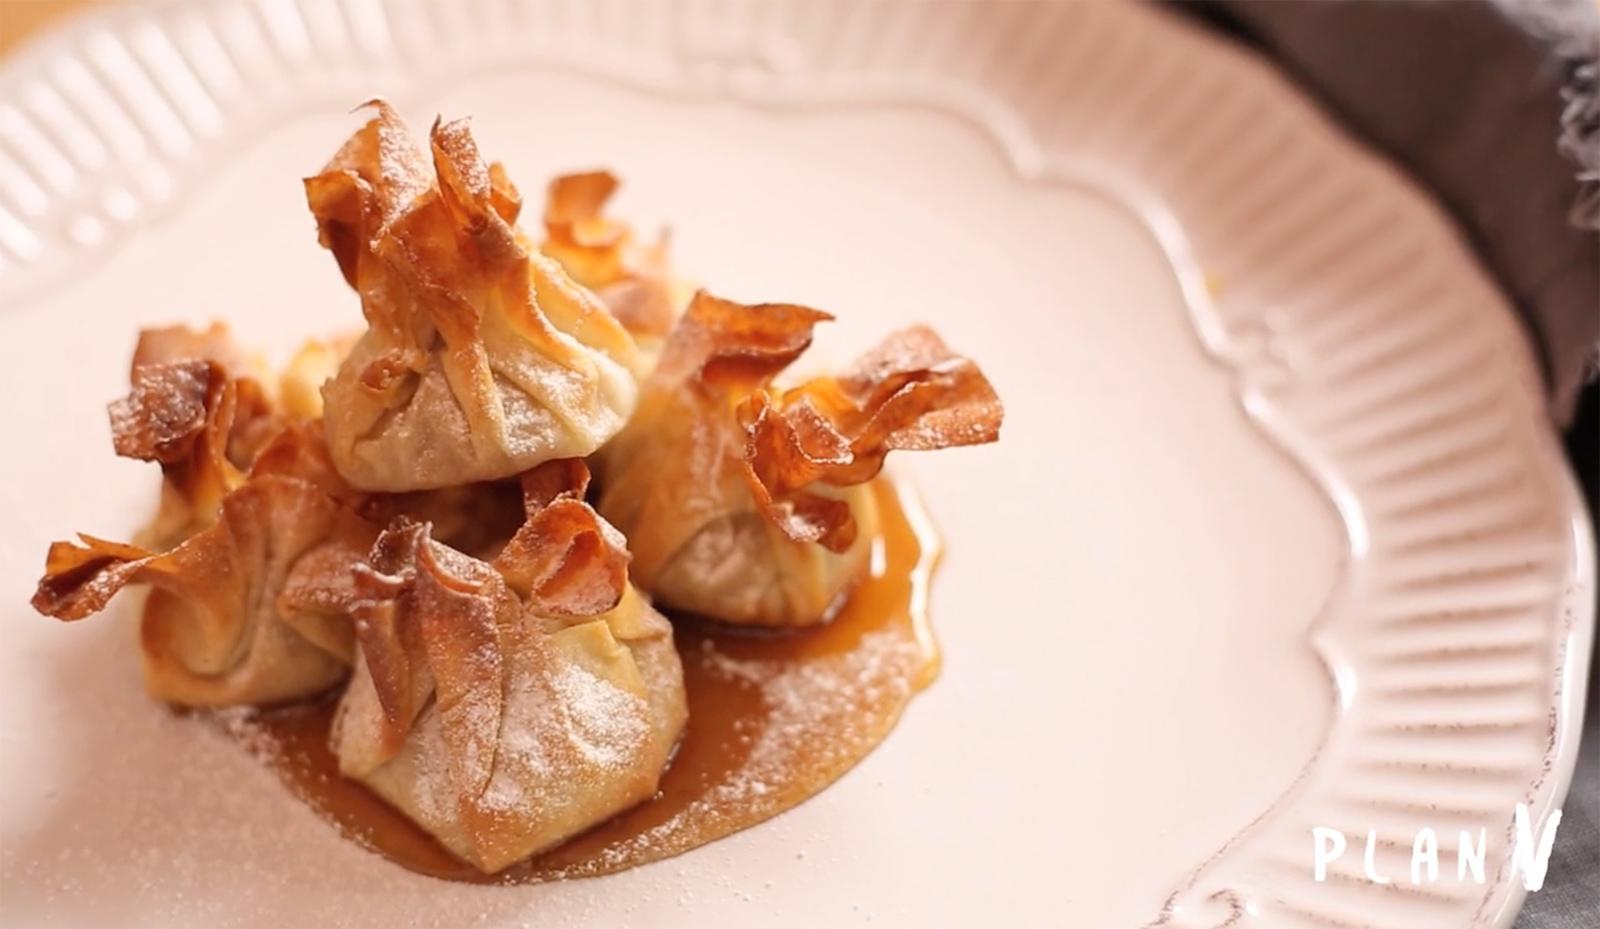 Saquitos de masa philo rellenos con pera